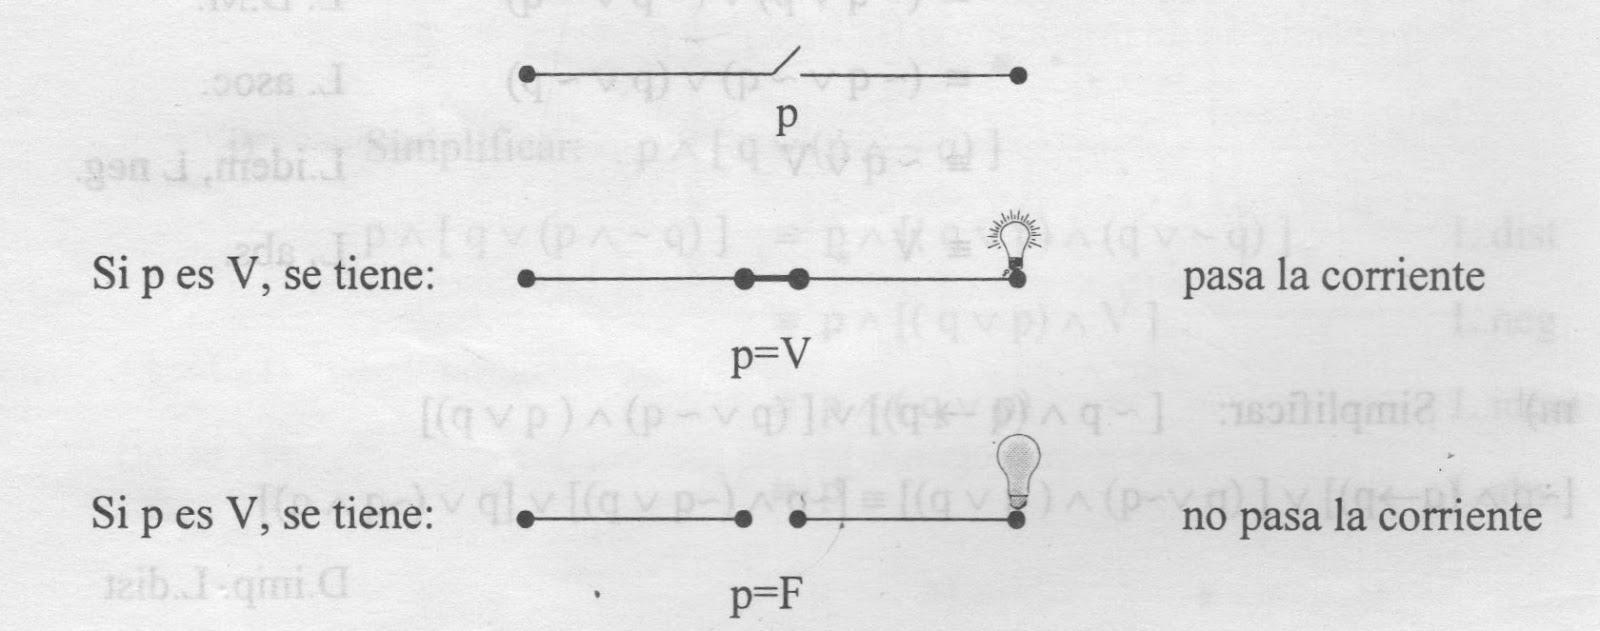 Circuito Logico : Manual de circuitos digitales i pdf